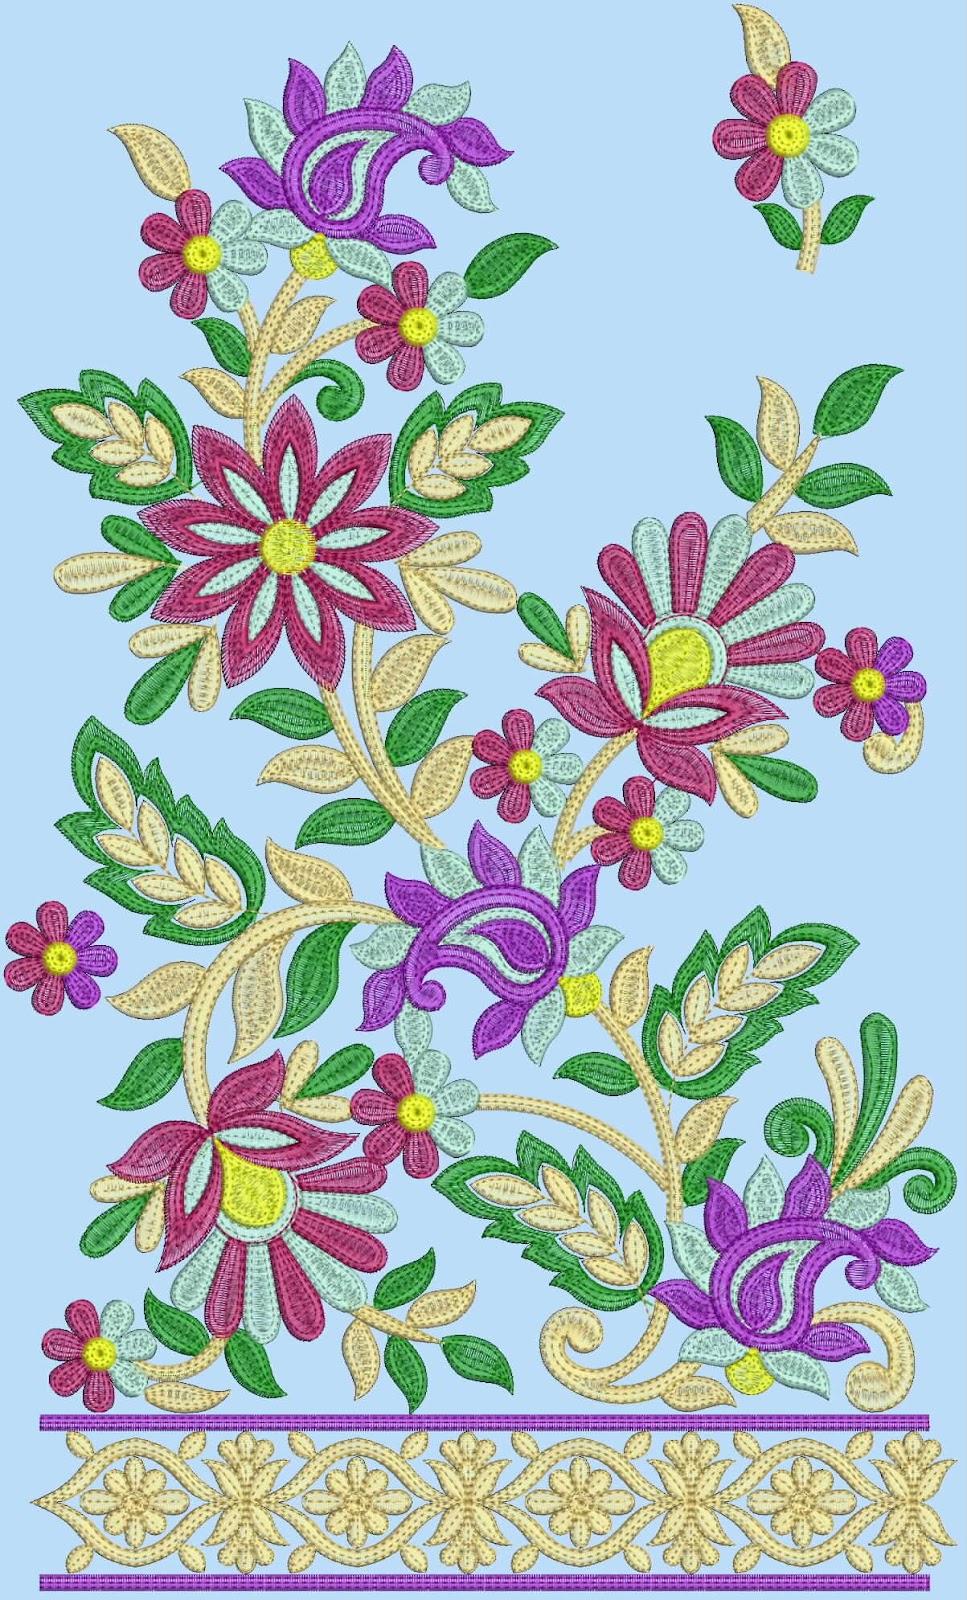 كل الرشمات جميلة Embroidery+salwar+suits+design